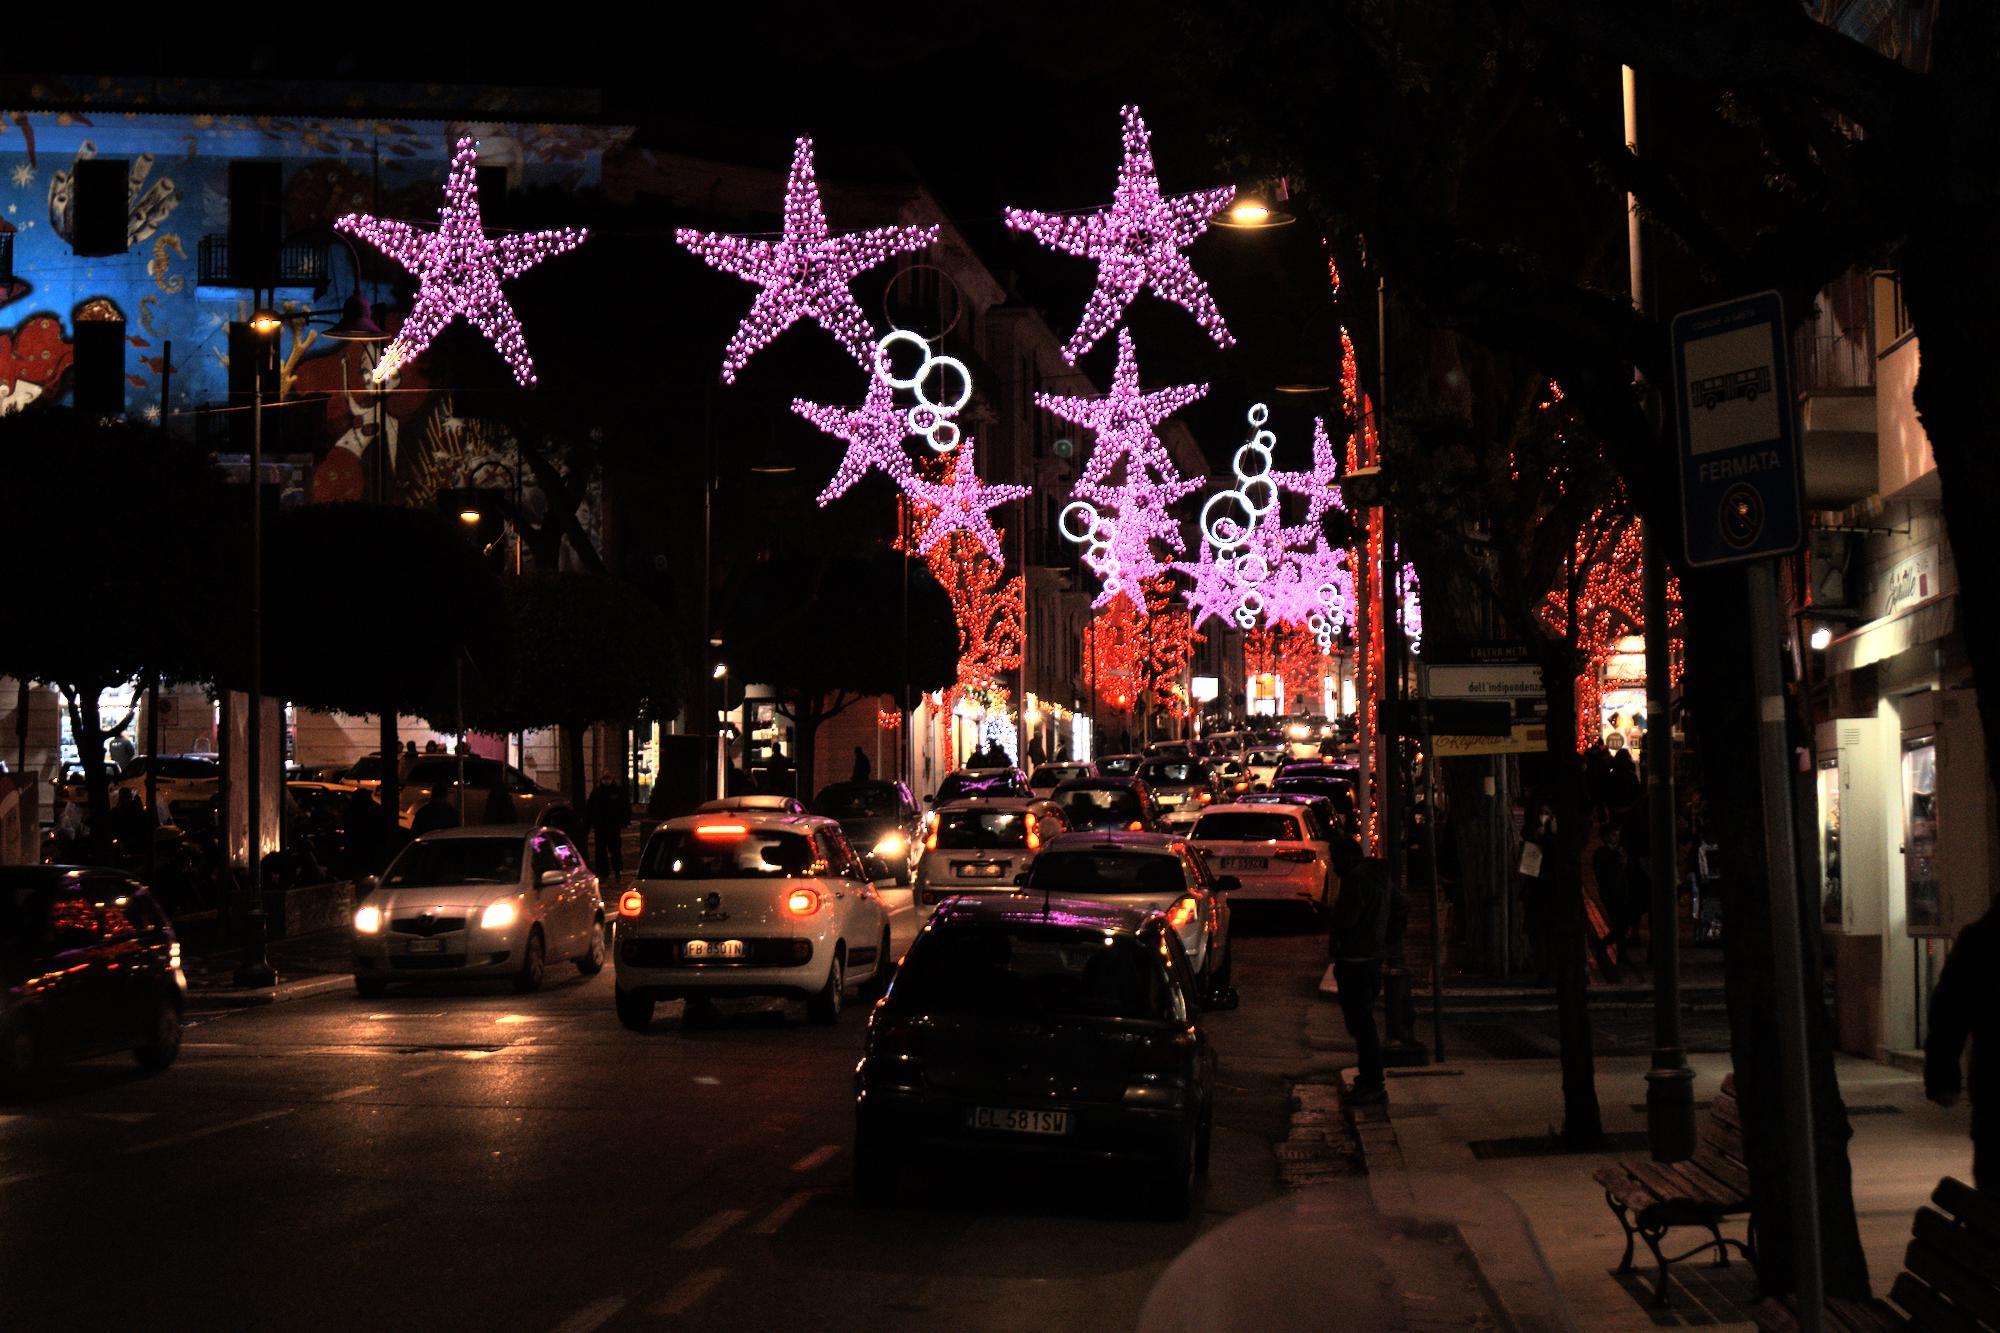 Photos: Gaeta's Festival of Lights